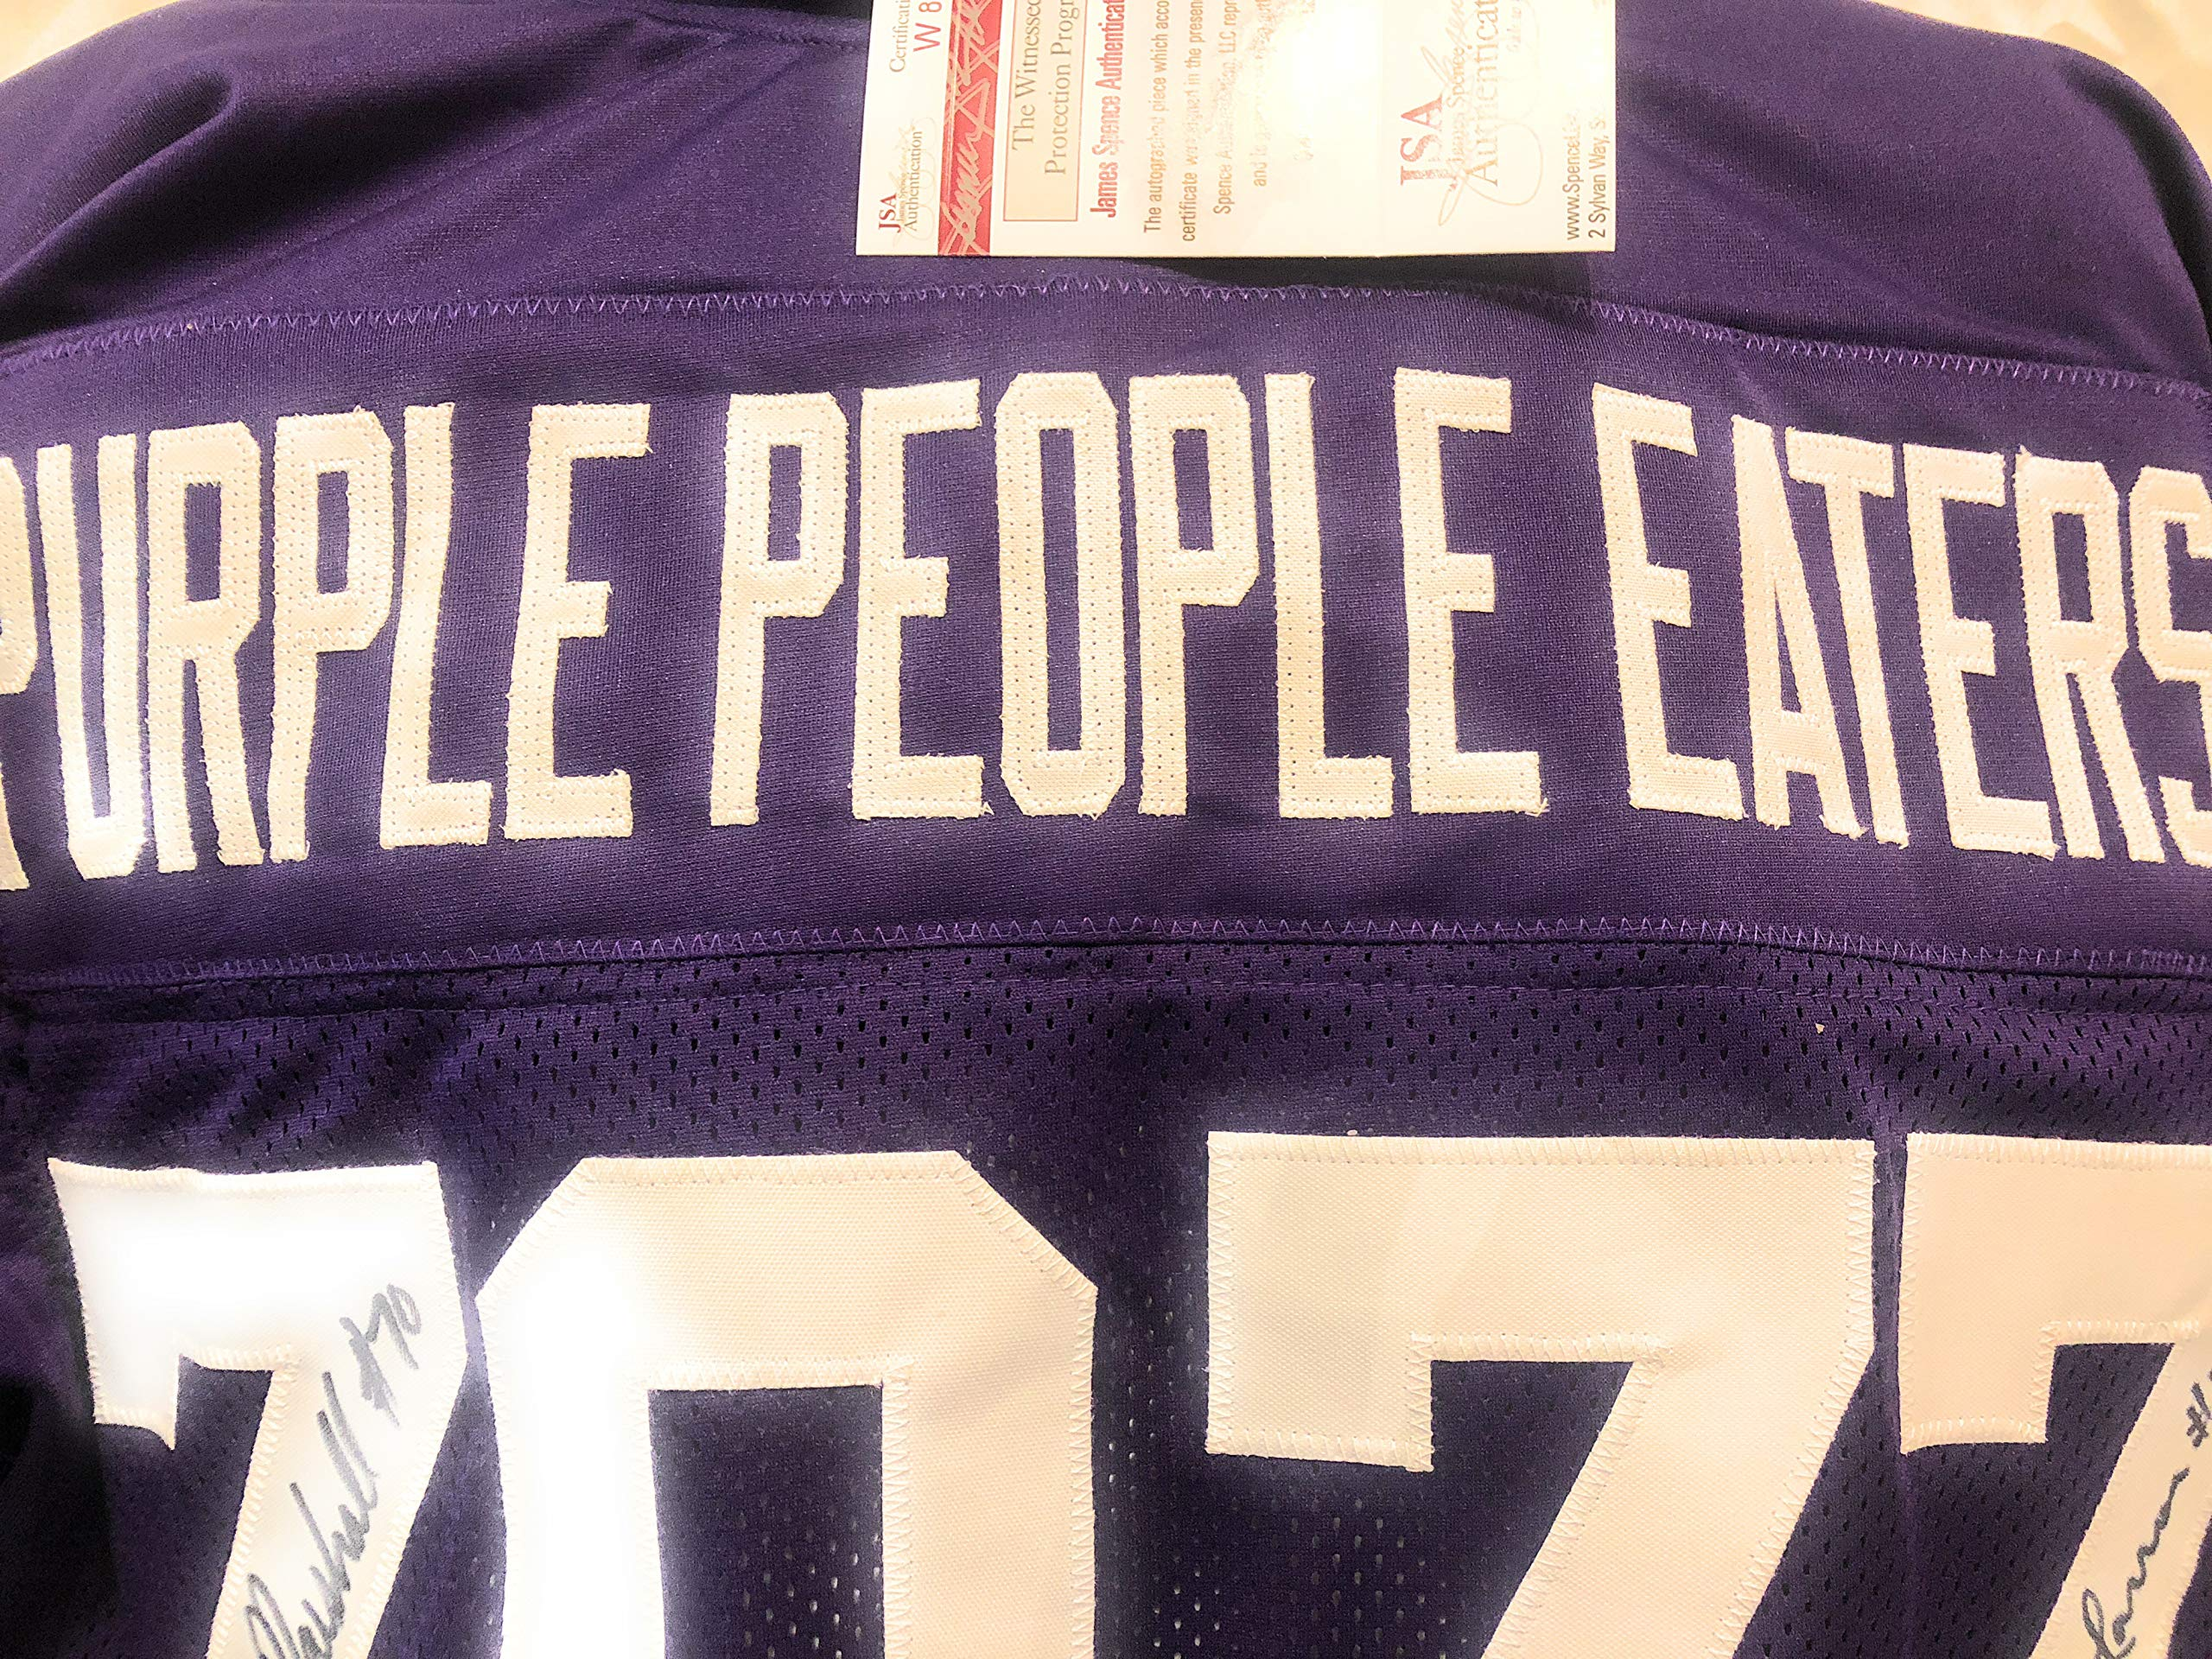 Alan Page Carl Eller Jim Marshall Gary Larsen Minnesota Vikings Signed Autograph White Custom Jersey Purple People Eaters JSA Witnessed Certified